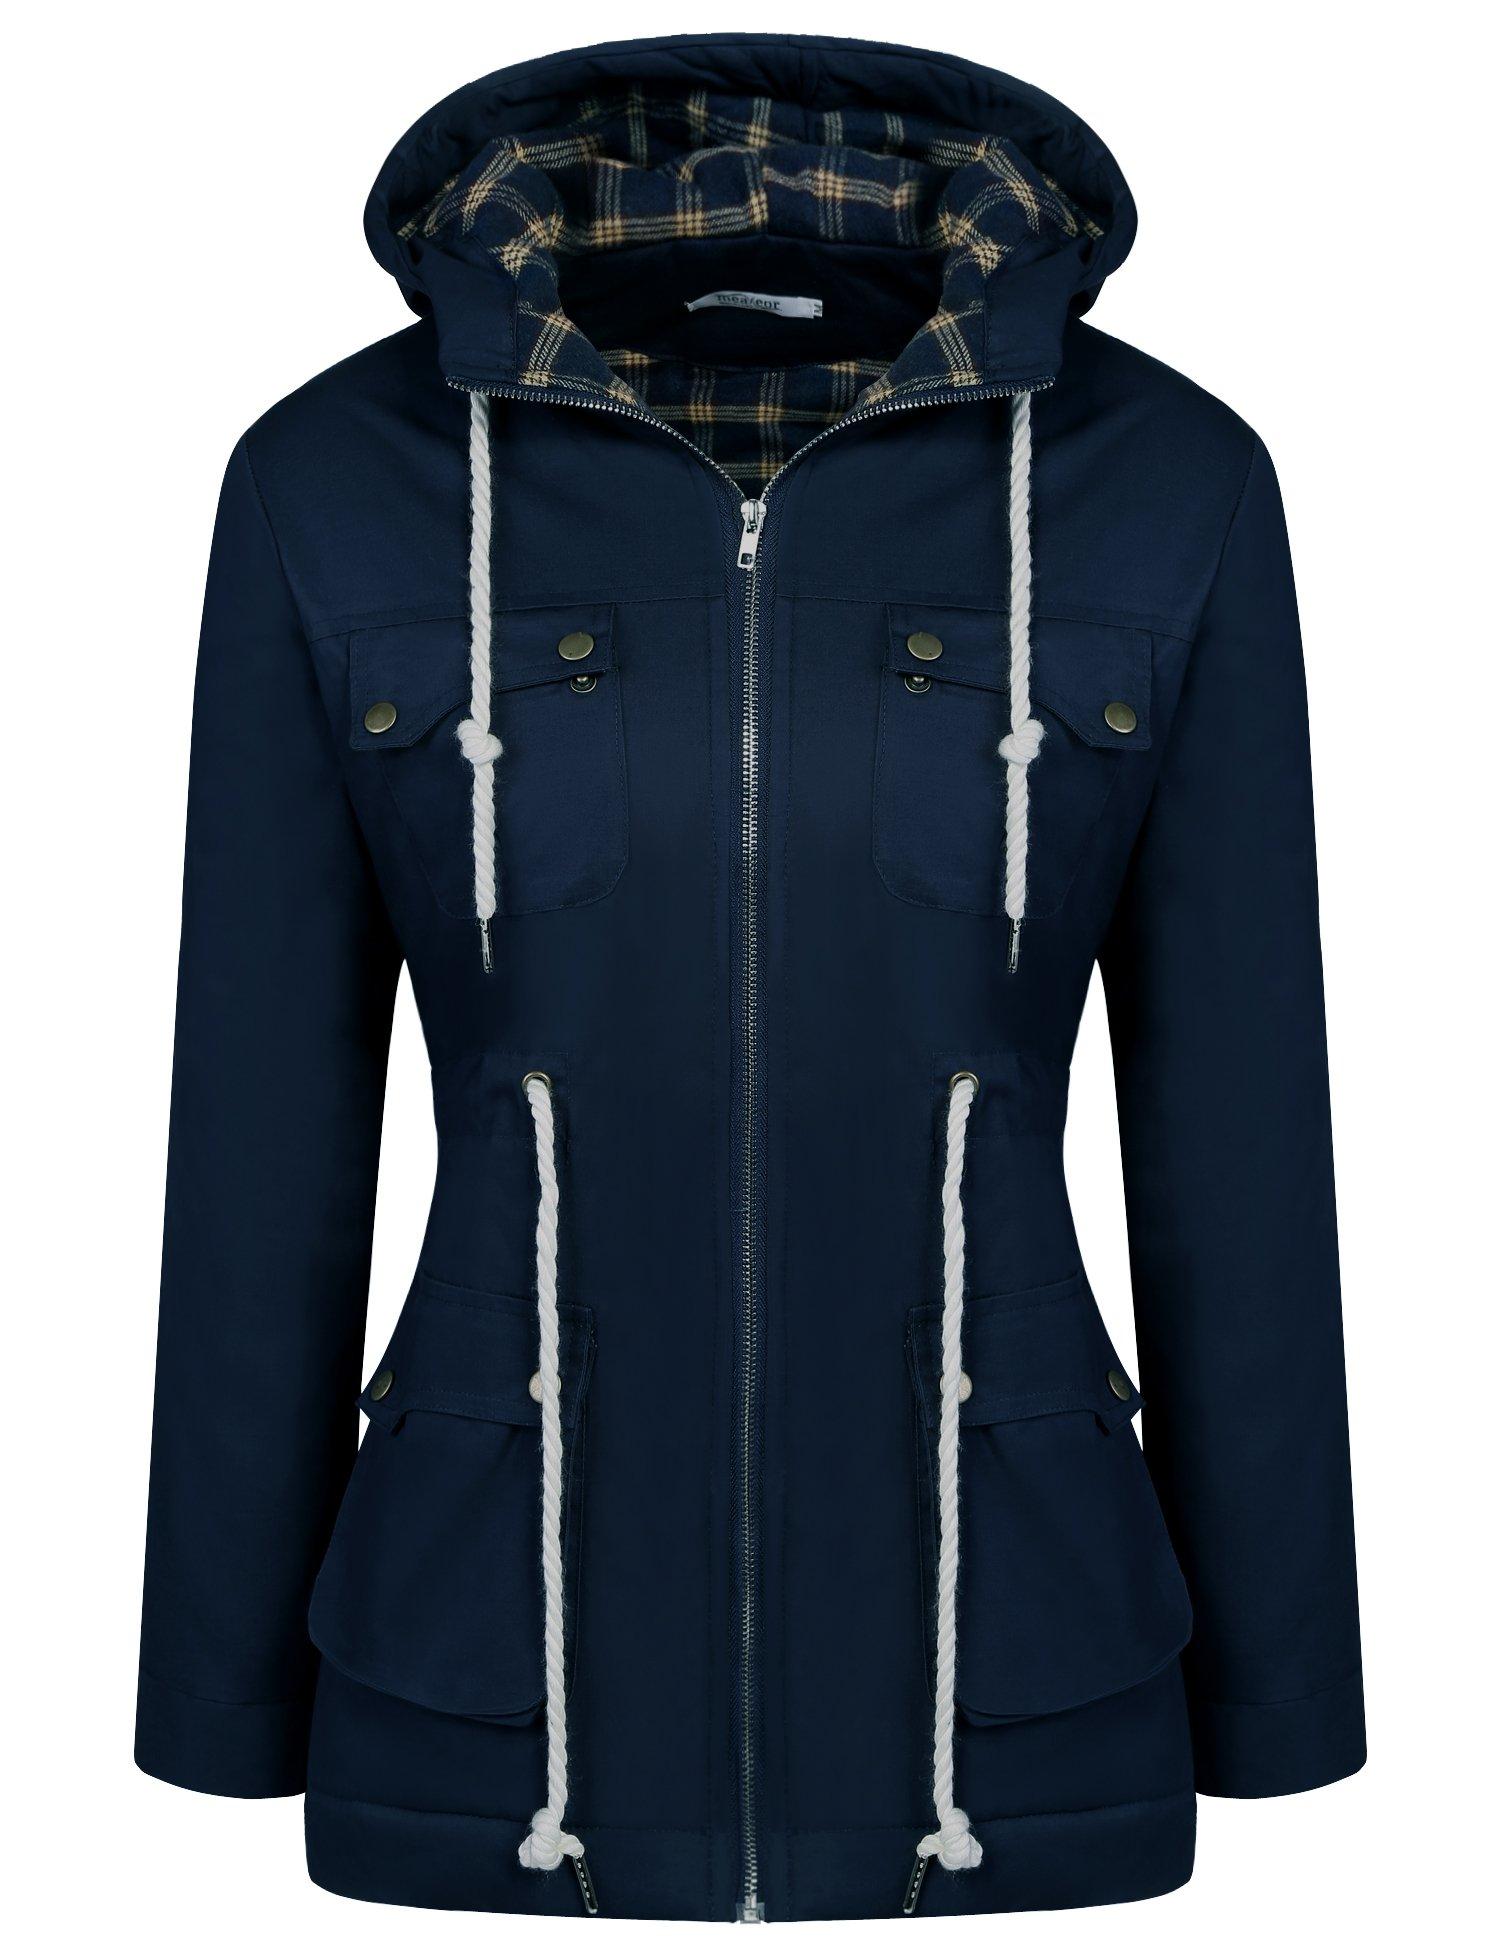 ELESOL Women's Military Hooded Warm Lined Parka Winter Anorak Jacket Coats Navy Blue XL